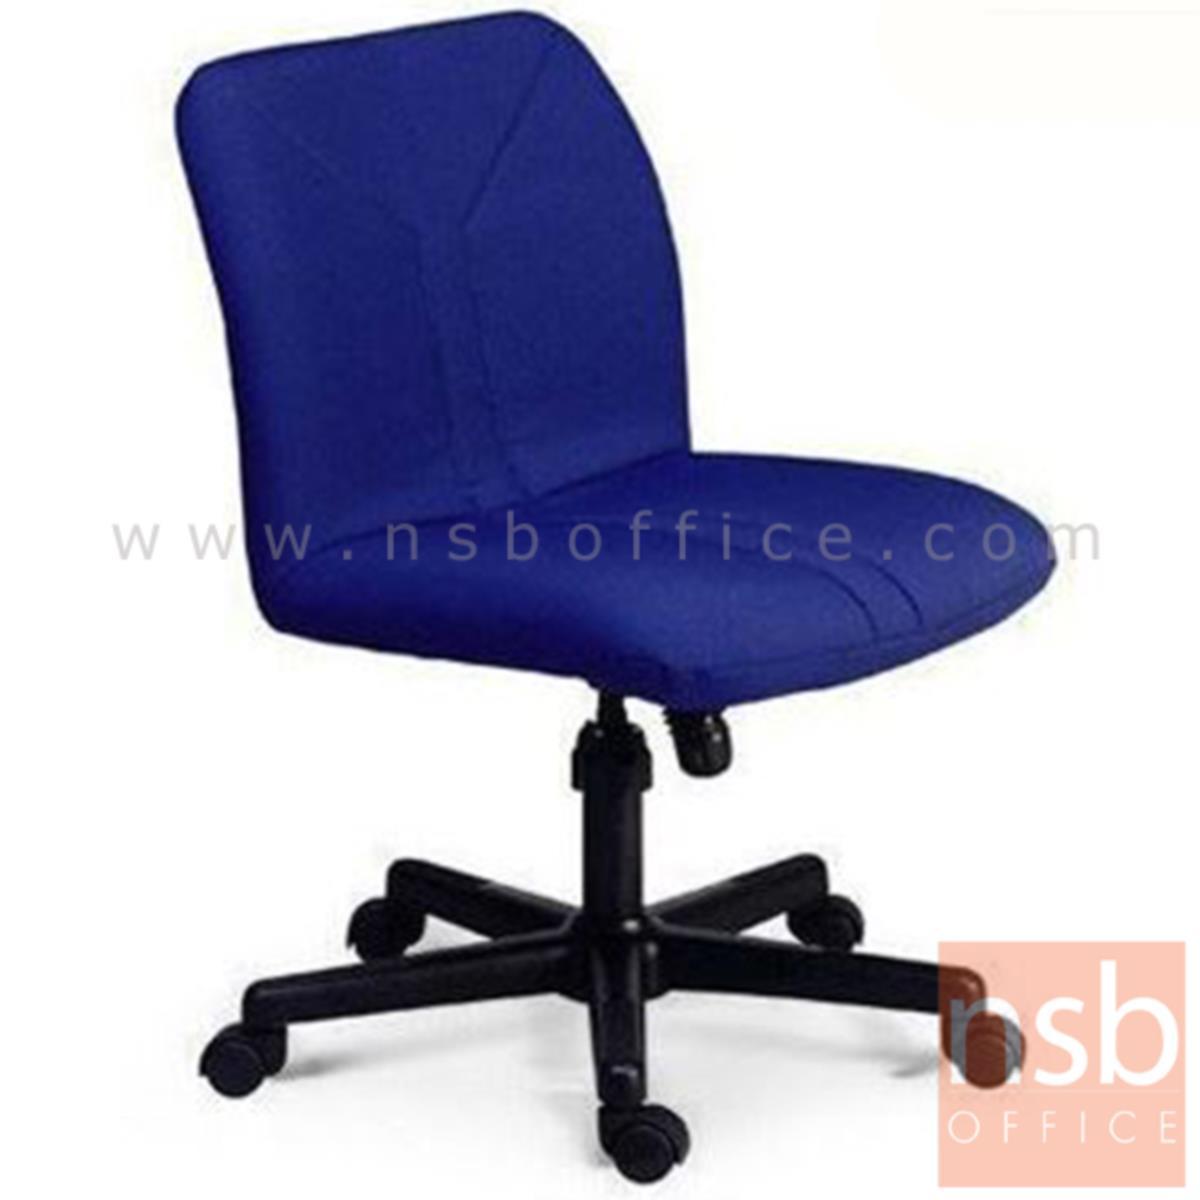 B03A477:เก้าอี้สำนักงาน  รุ่น Geraldine (เจอราลดีน)  ก้อนโยก ขาพลาสติก